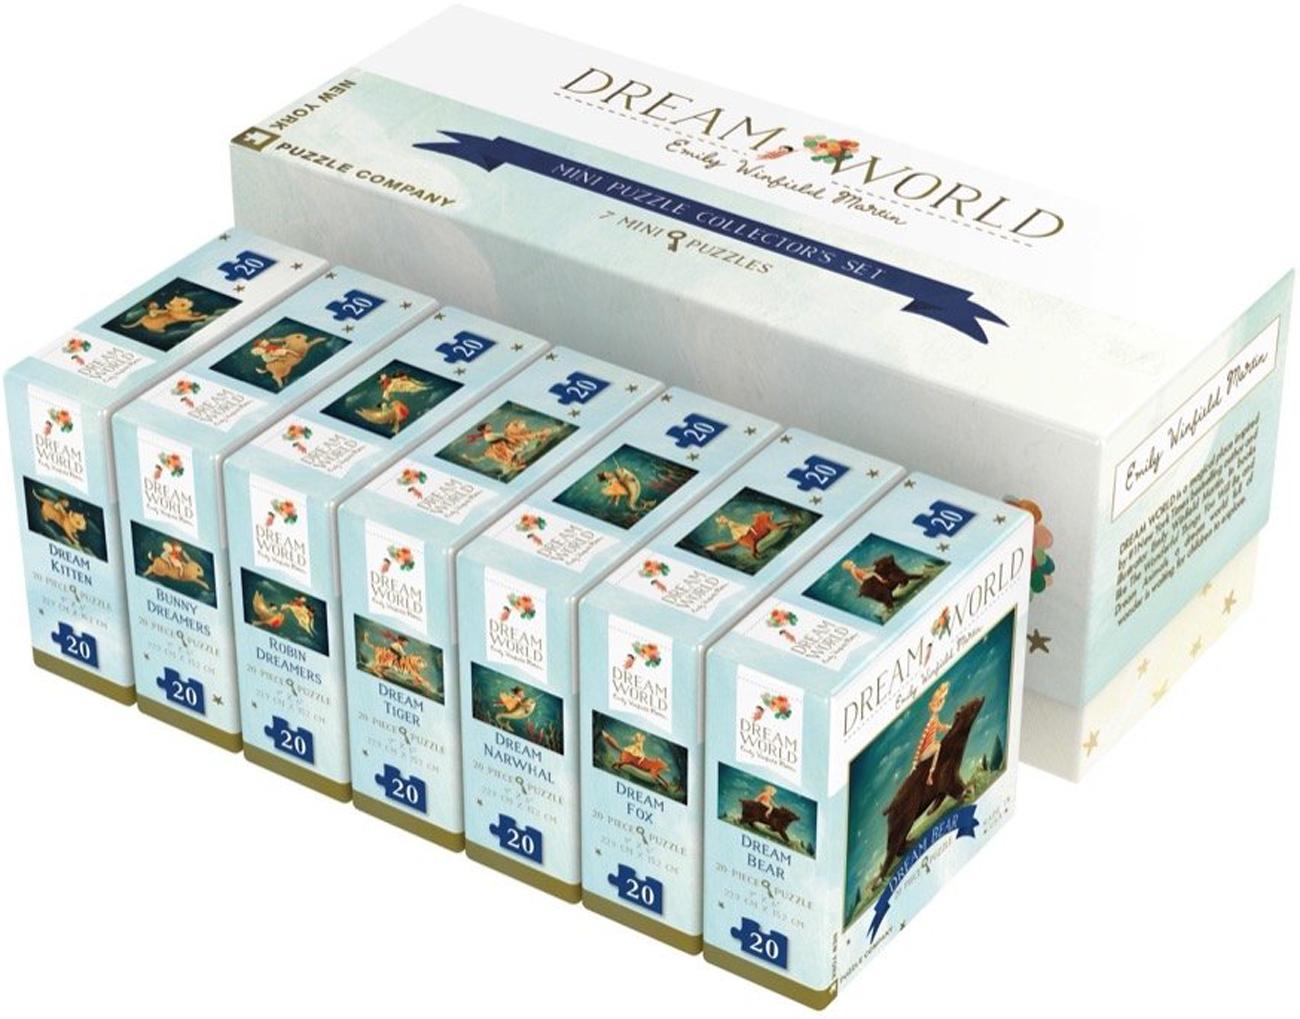 Dream World Mini Puzzle Collector's Set Movies / Books / TV Jigsaw Puzzle